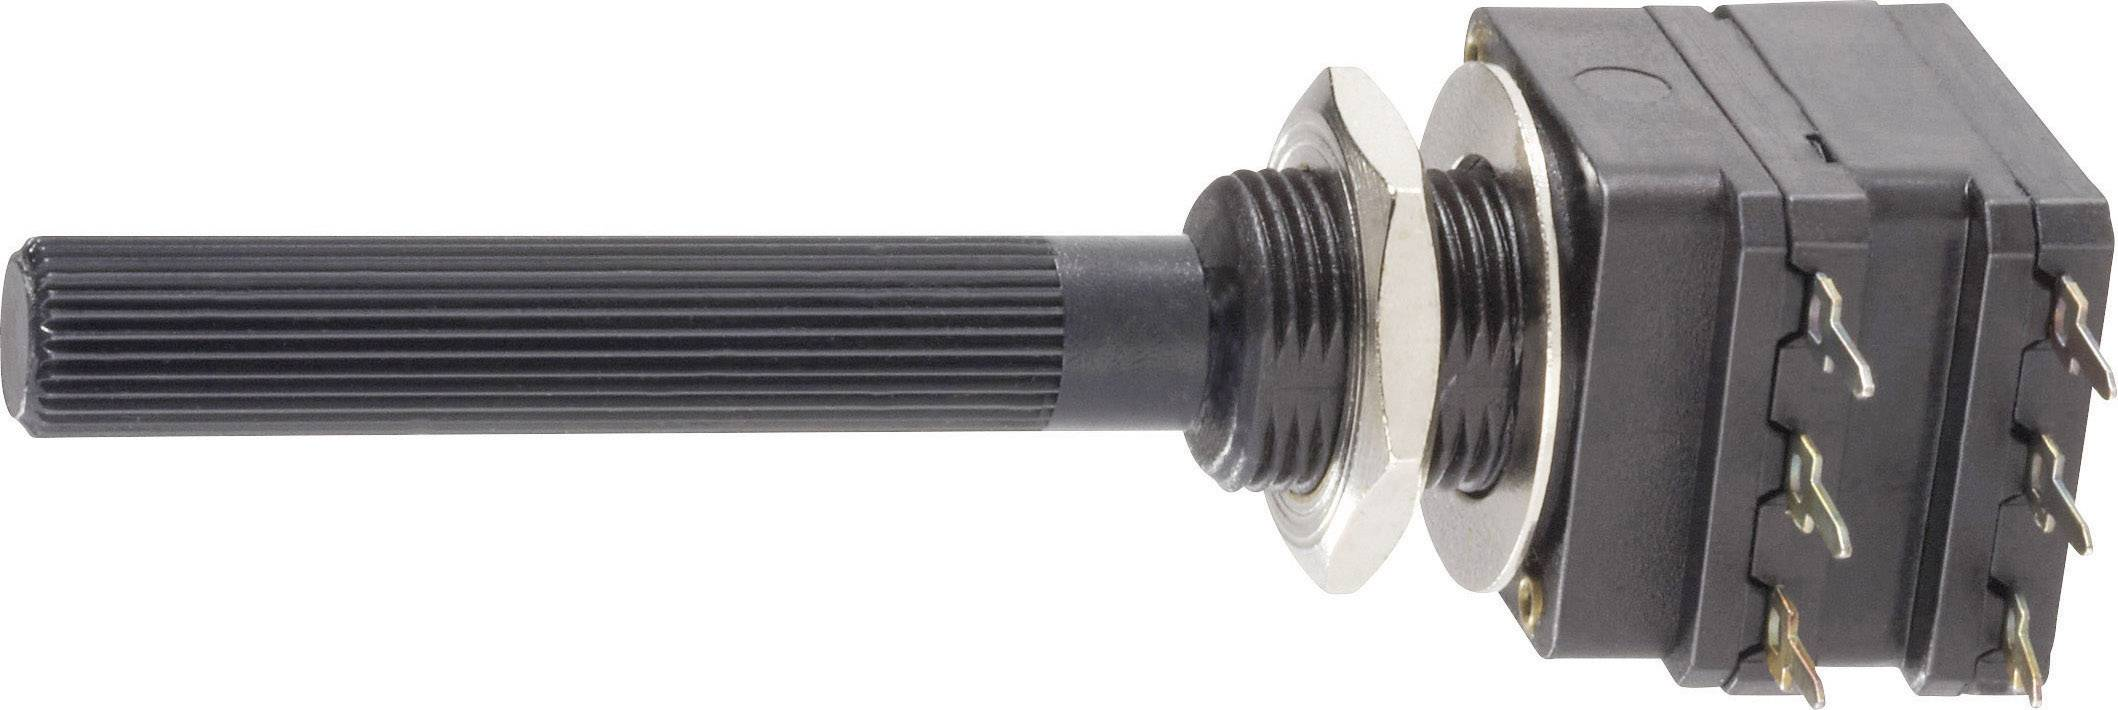 Otočný potenciometer stereo Piher PC16DH-10IP06103B2020MTA PC16DH-10IP06103B2020MTA, 0.1 W, 10 kOhm, 1 ks